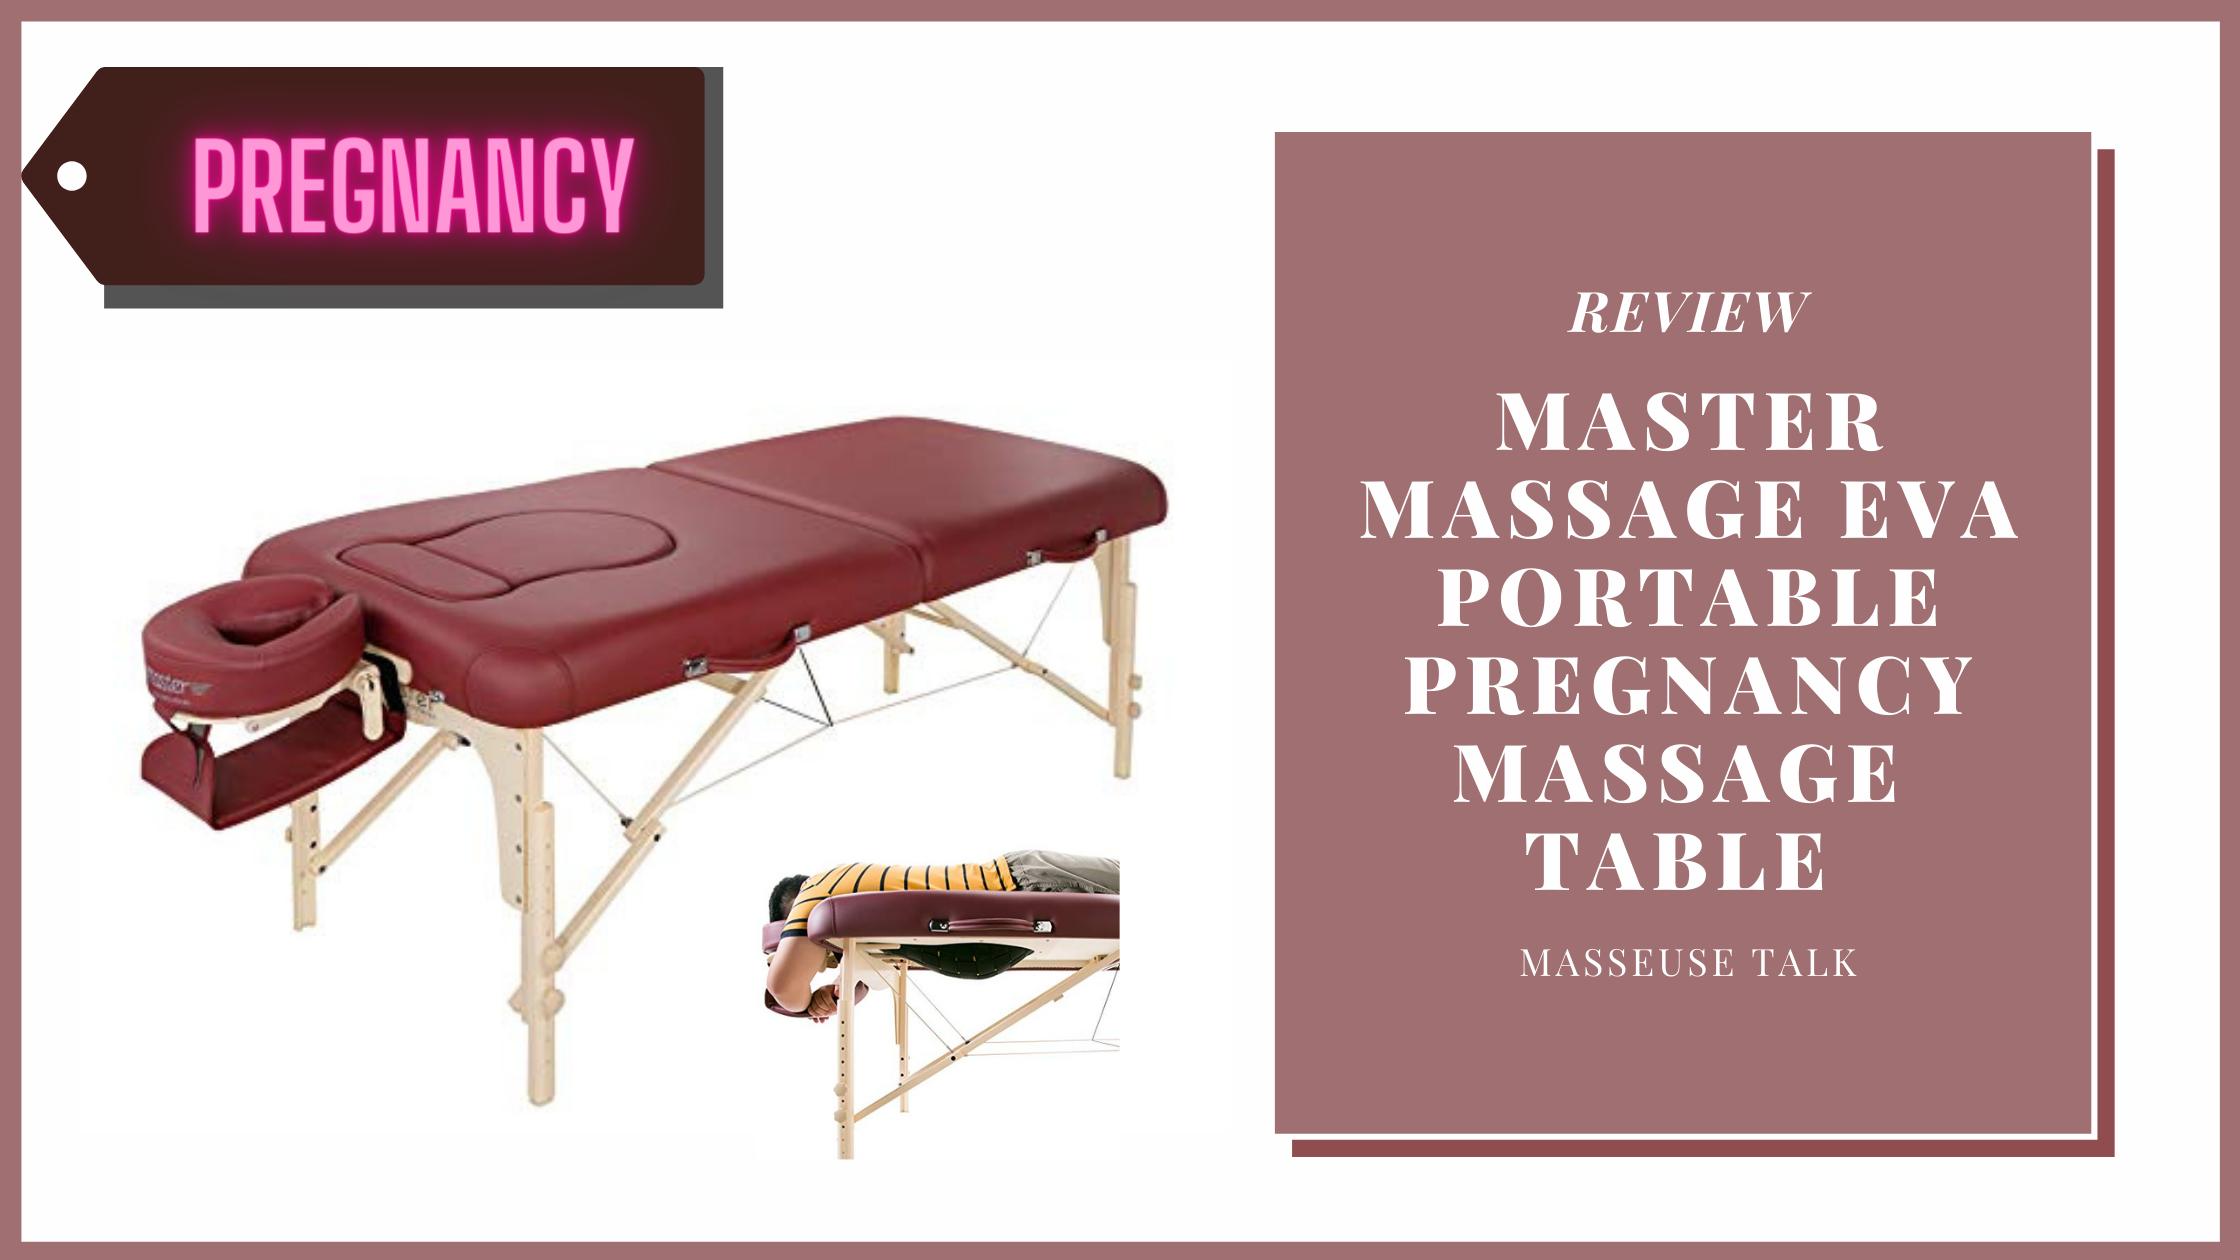 Master Massage Eva Pregnancy Massage Table